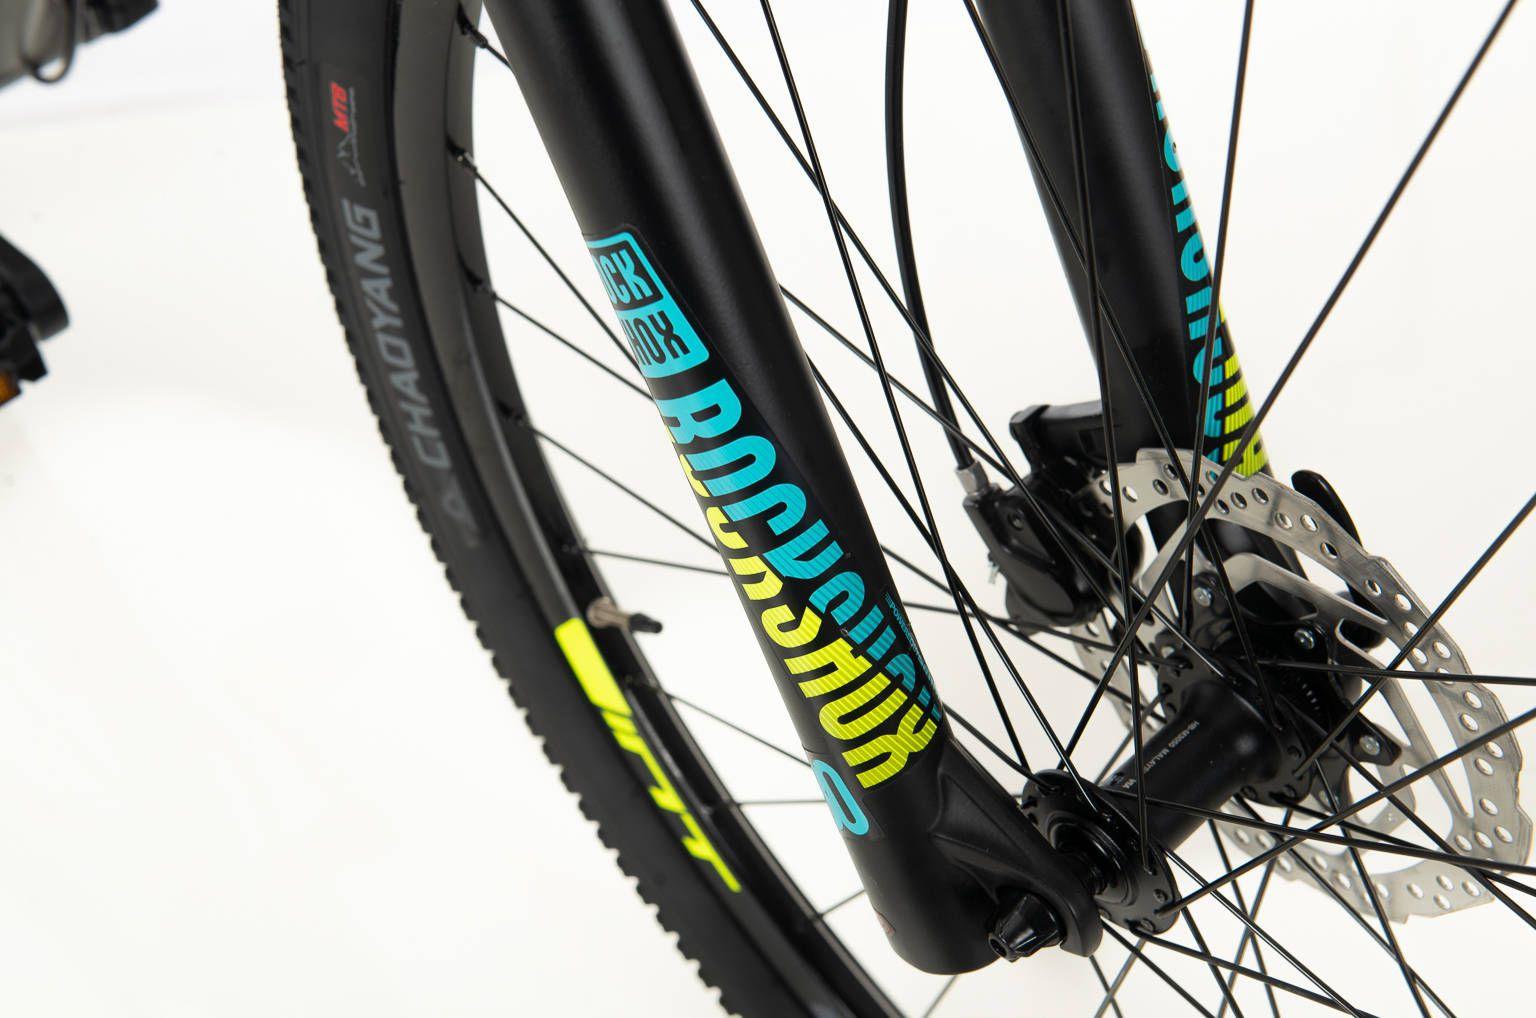 Bicicleta 29 Sense Intensa  2020 Alivio Amr/Azl 27v Alivio